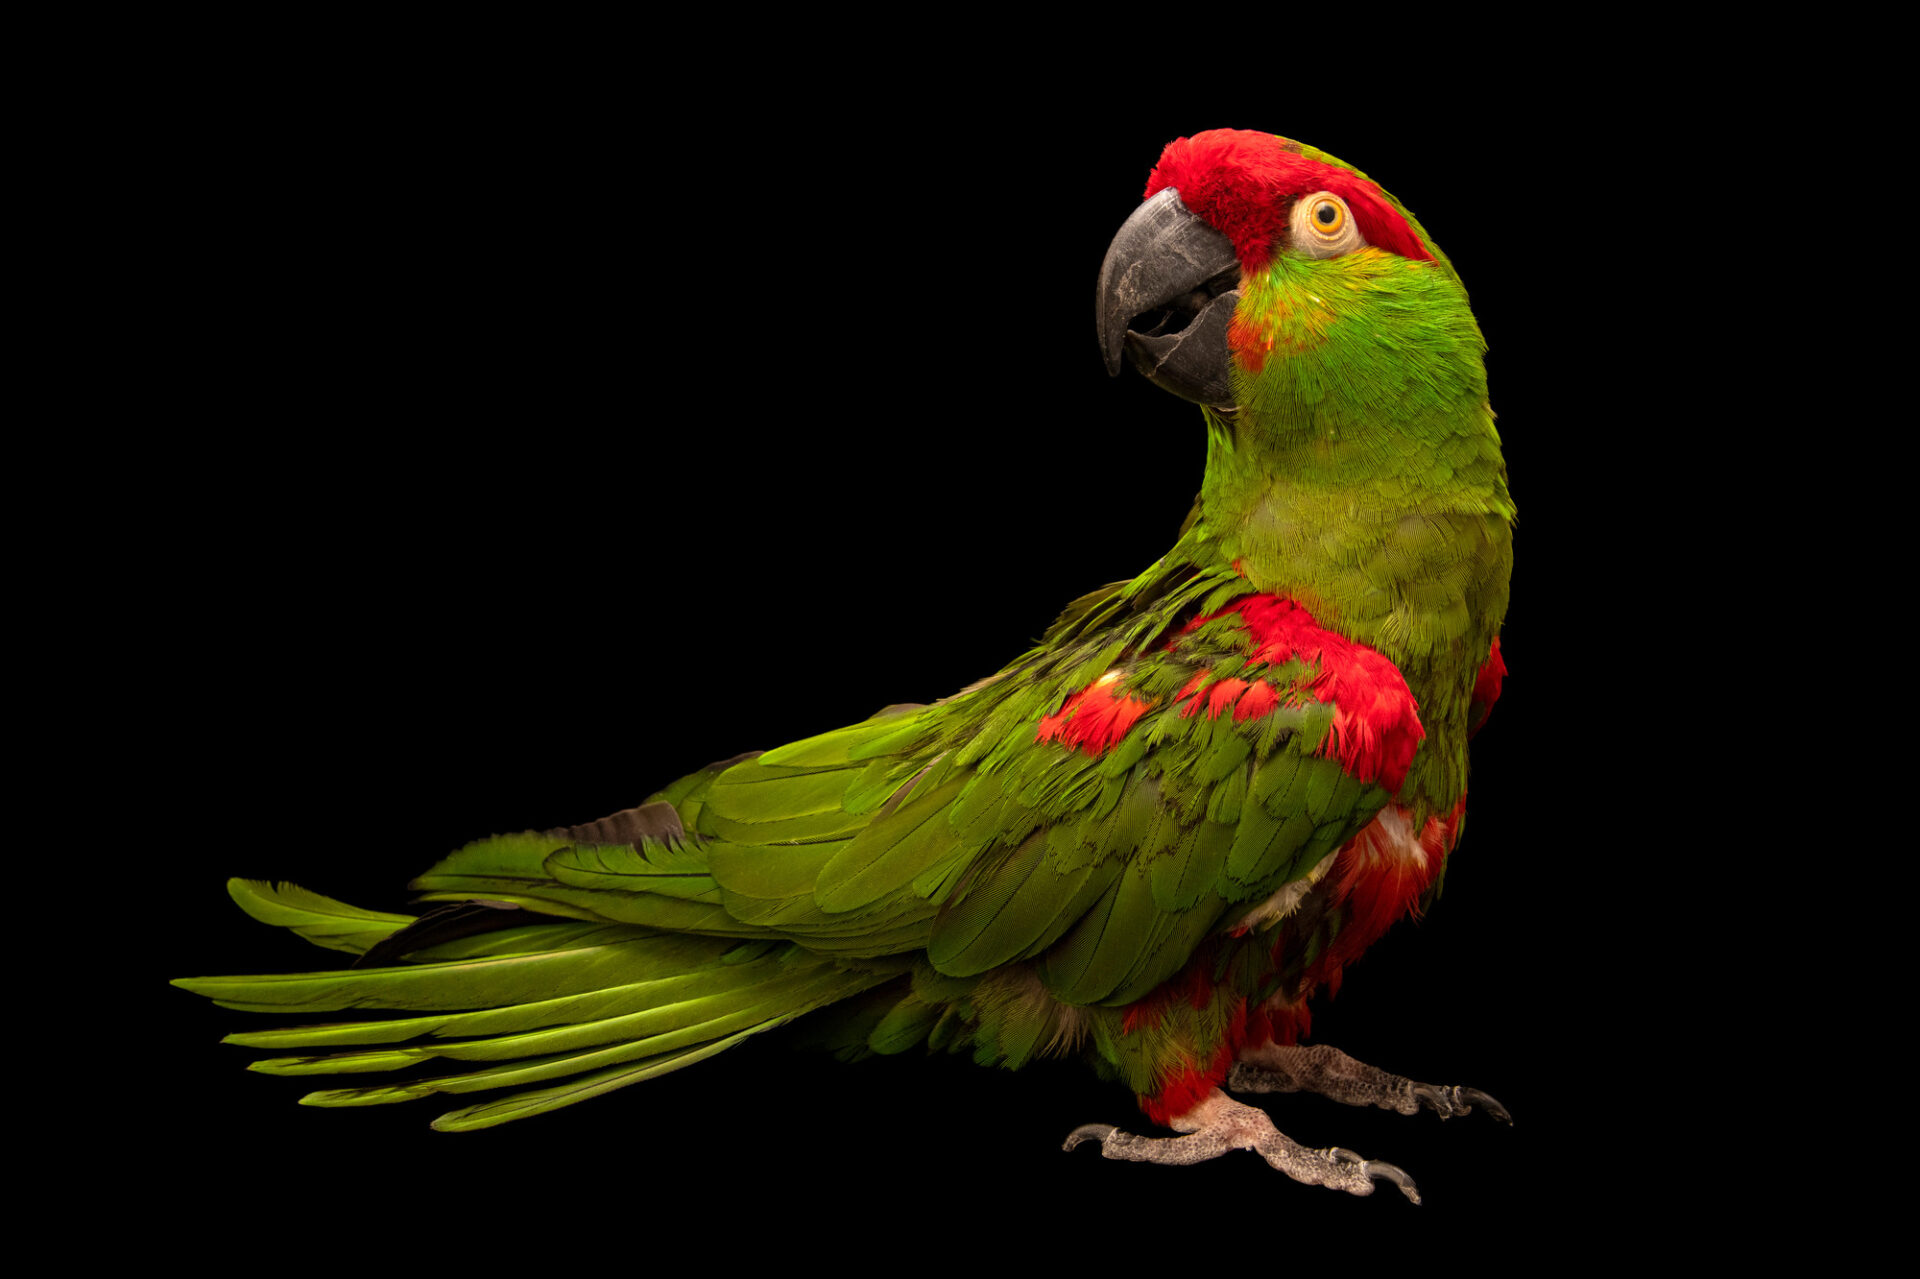 Photo: An endangered thick-billed parrot (Rhynchopsitta pachyrhyncha) at World Bird Sanctuary.